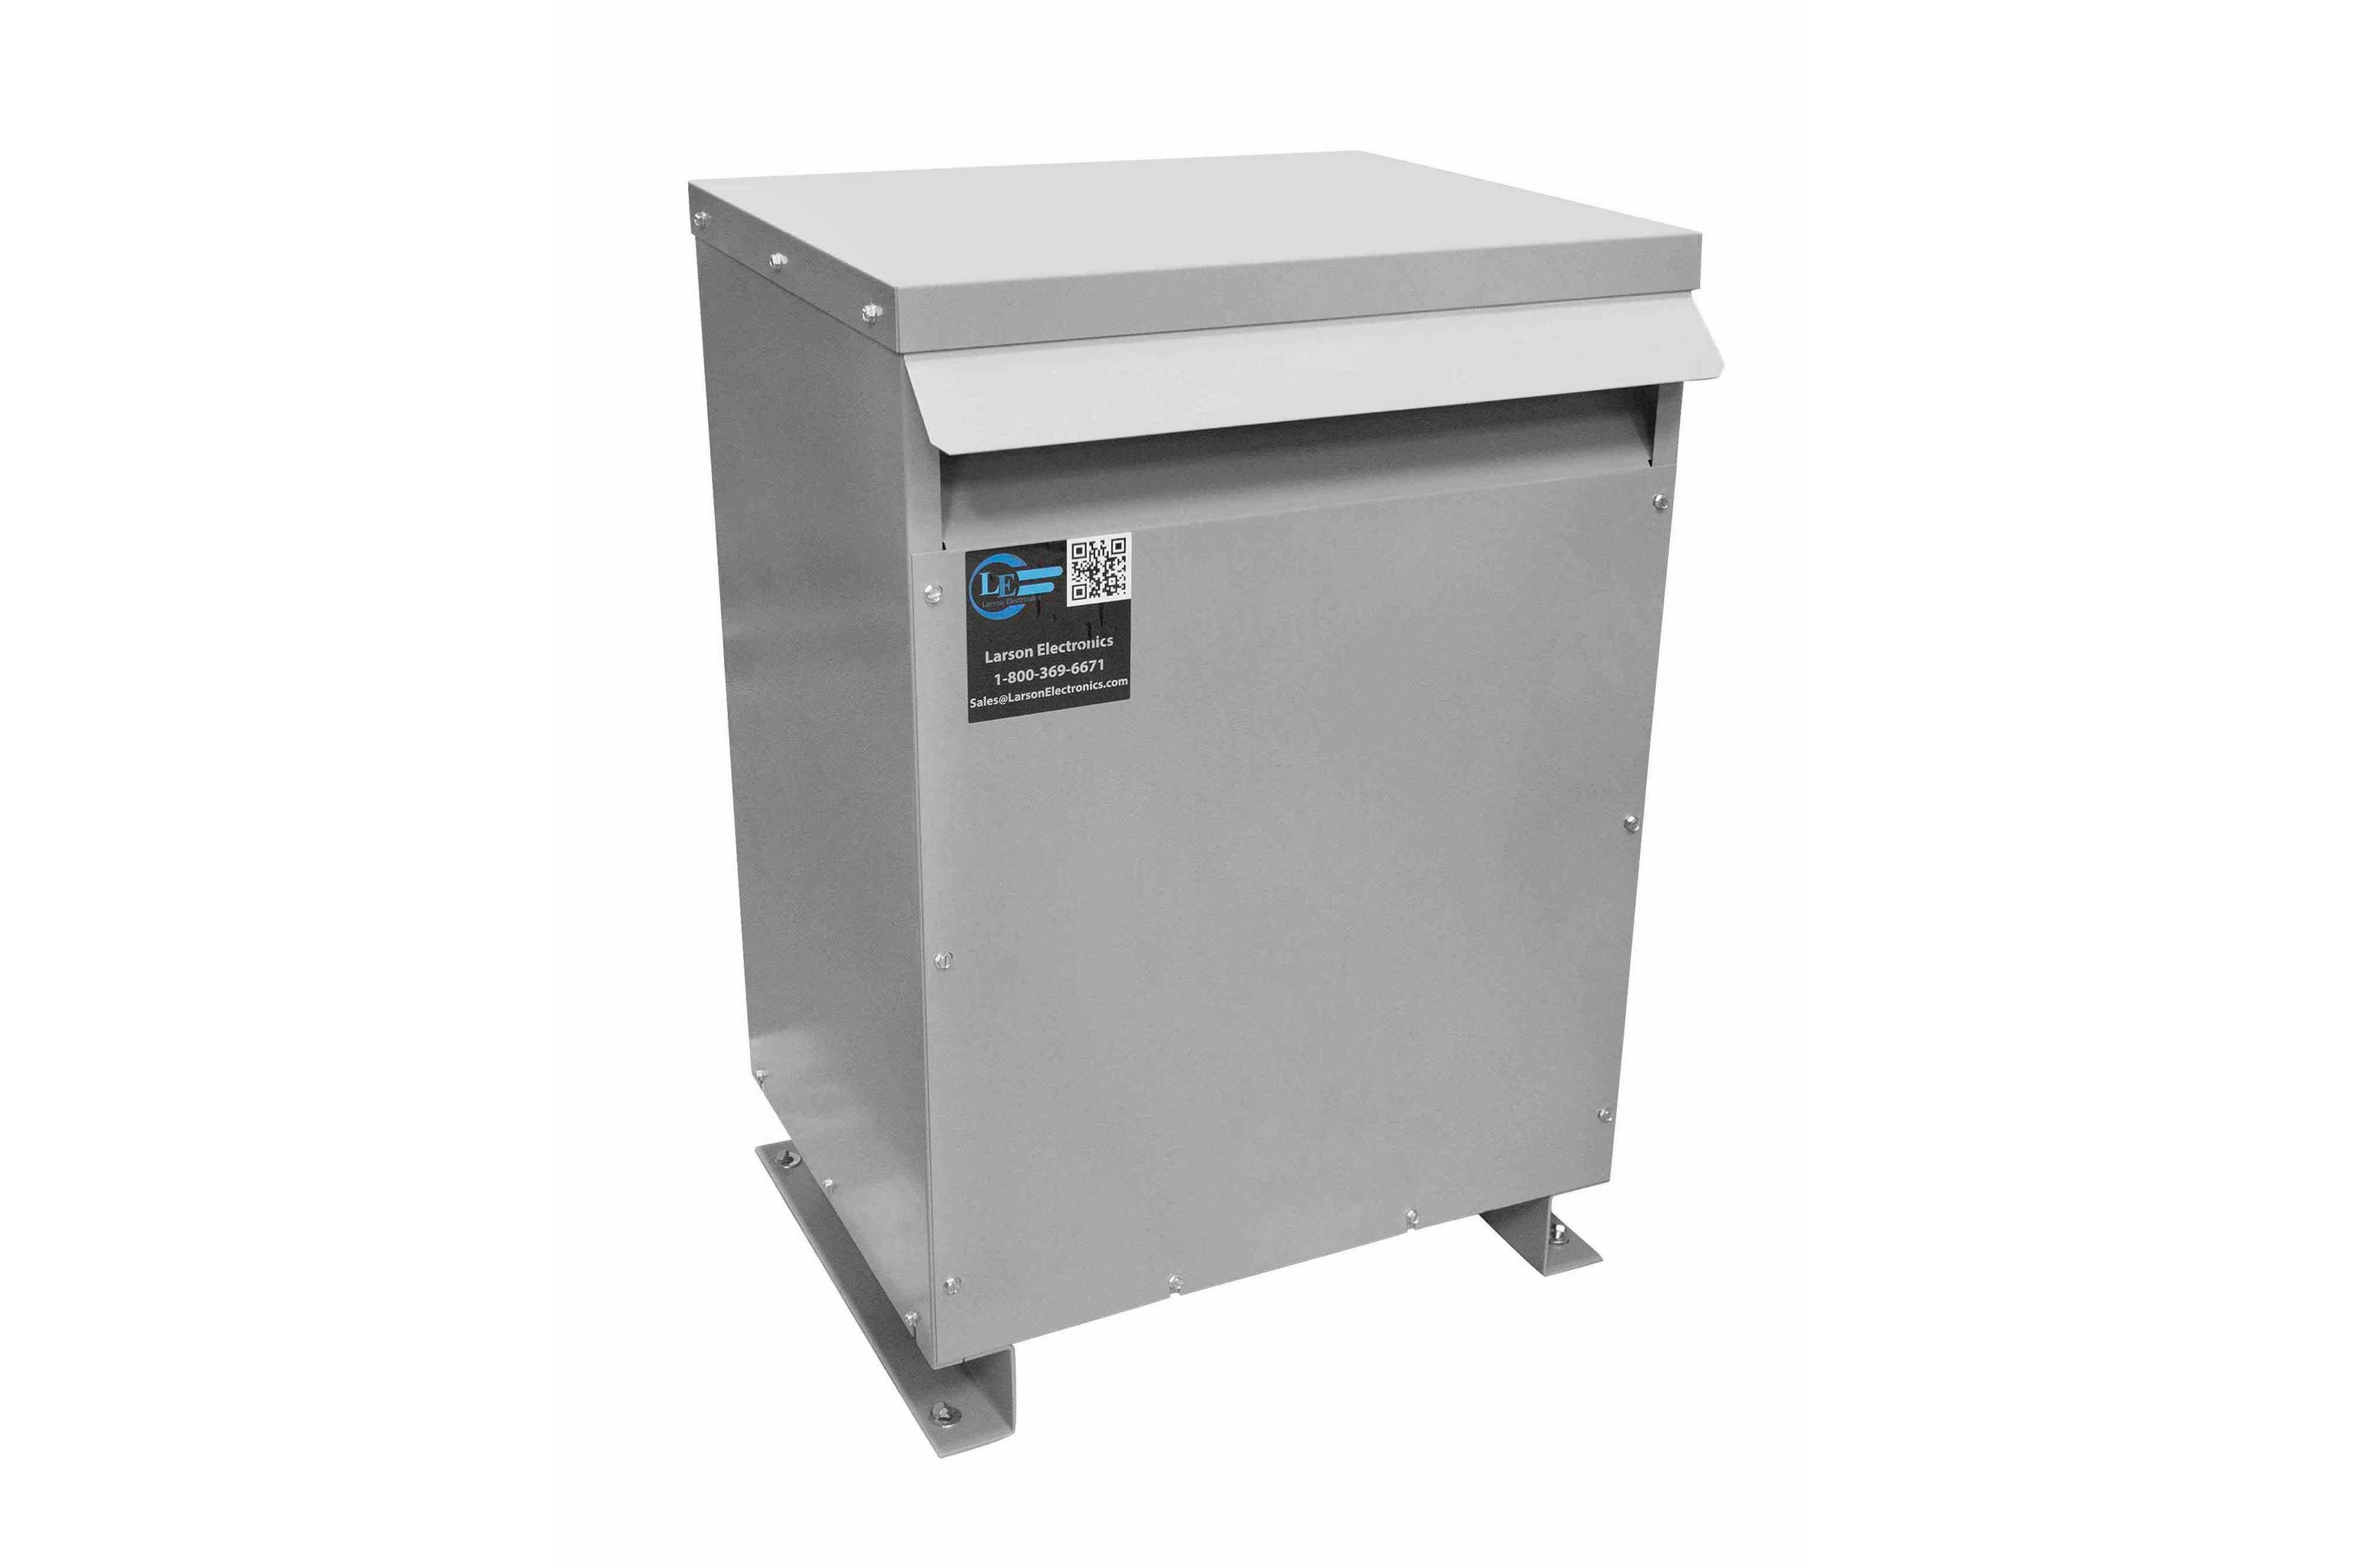 22.5 kVA 3PH Isolation Transformer, 600V Wye Primary, 480V Delta Secondary, N3R, Ventilated, 60 Hz